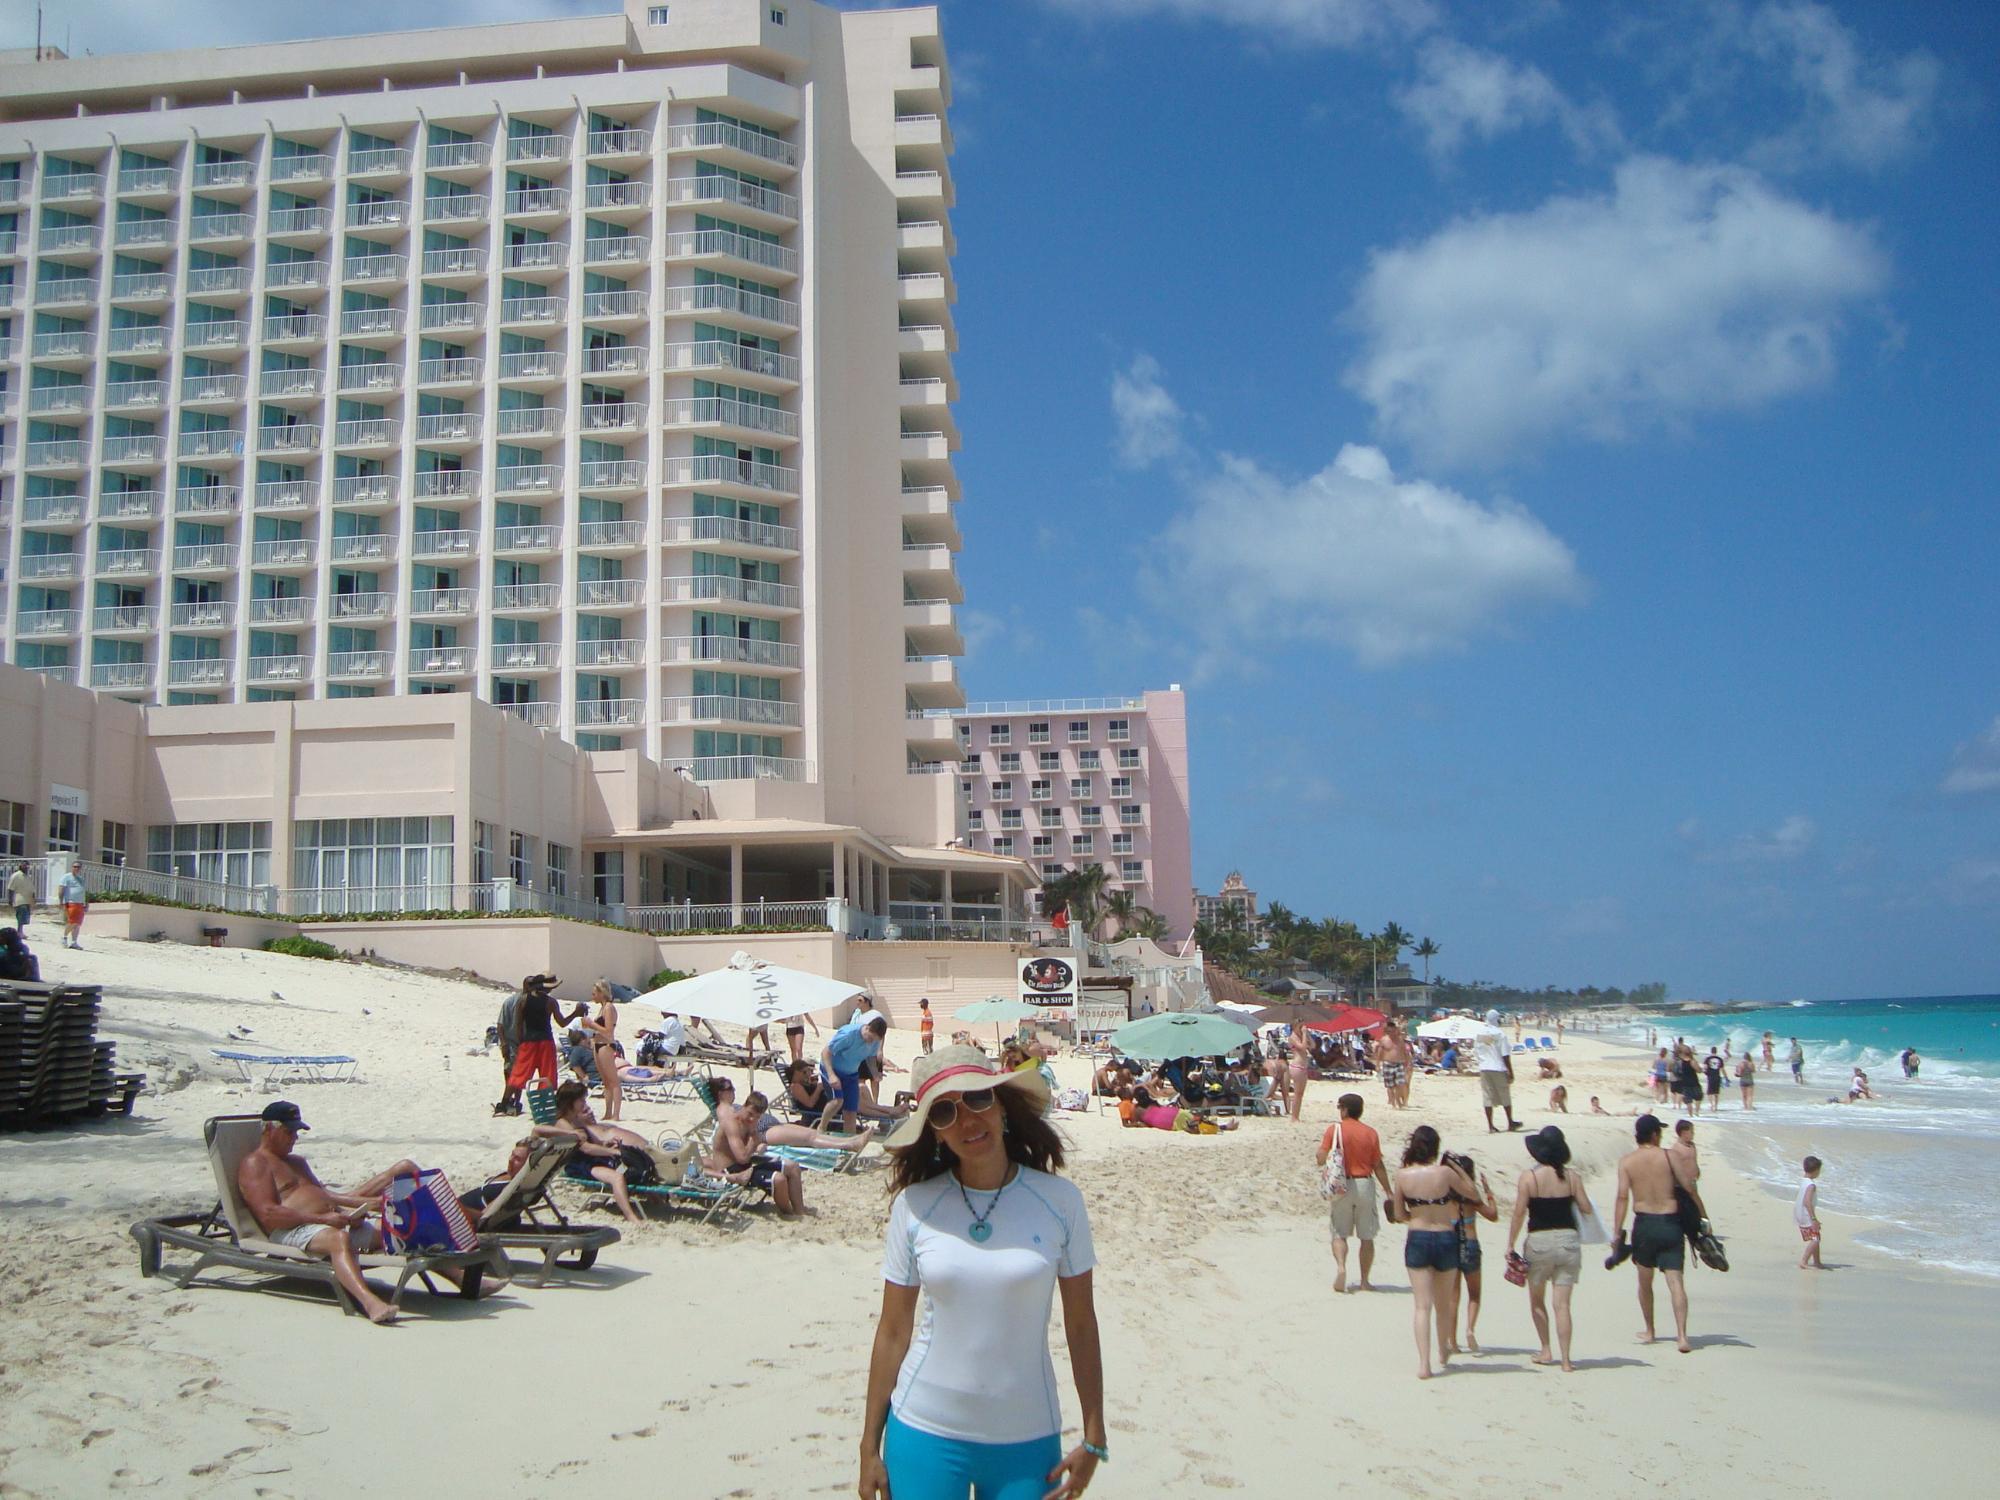 Playa en isla Atlantis